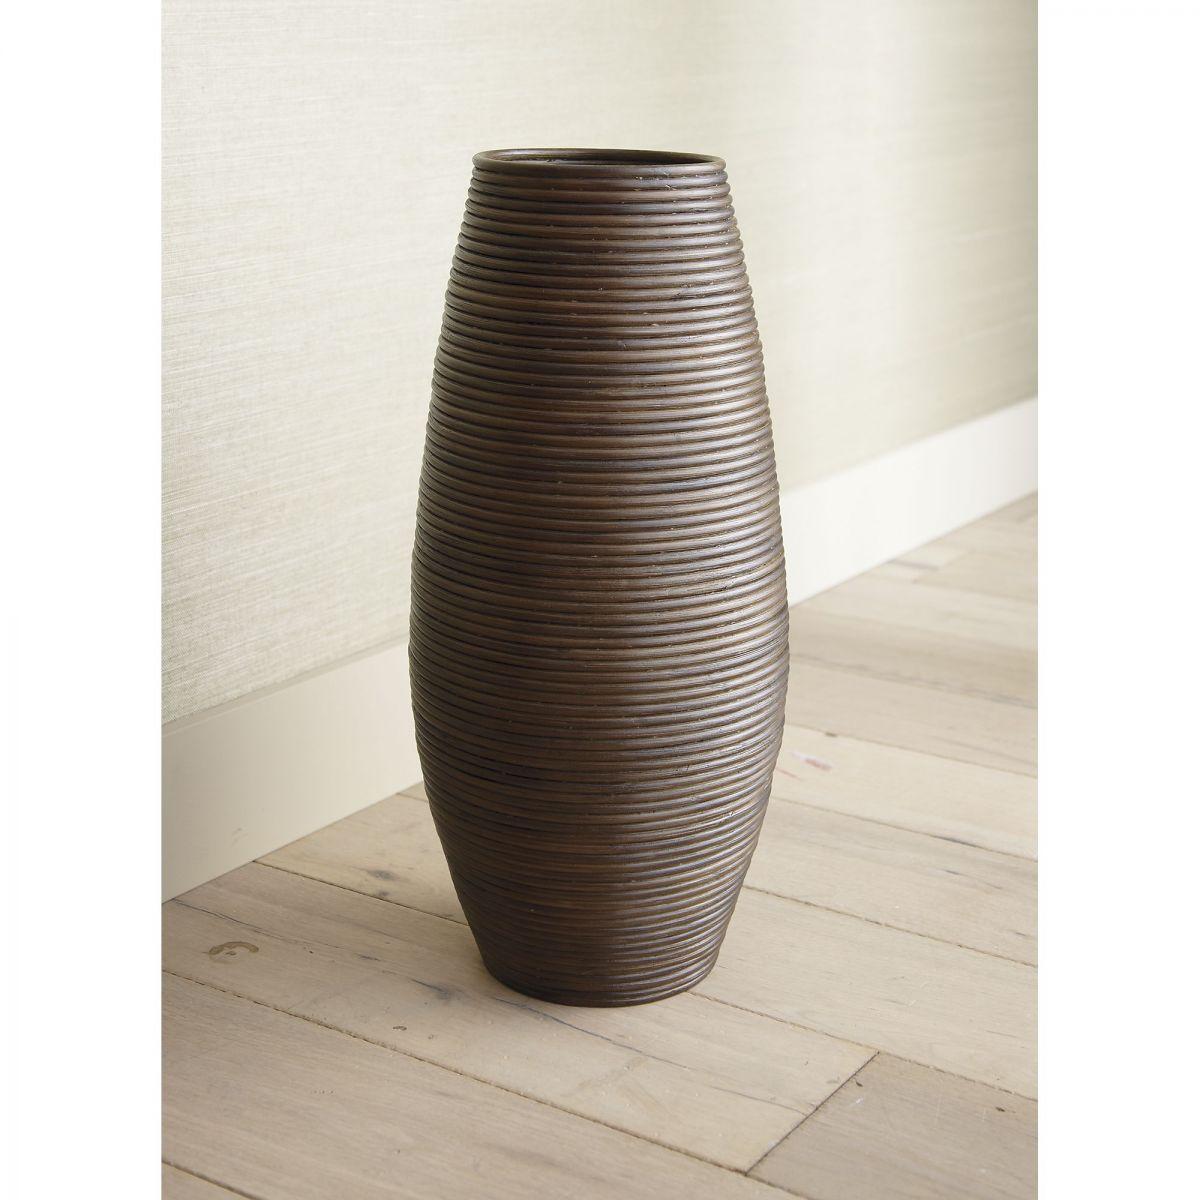 DoanKet I on orange floor vase, mid century orange ceramic vase, floor candle holder vase, wicker floor vase, floor urn vase, floor glass vase,